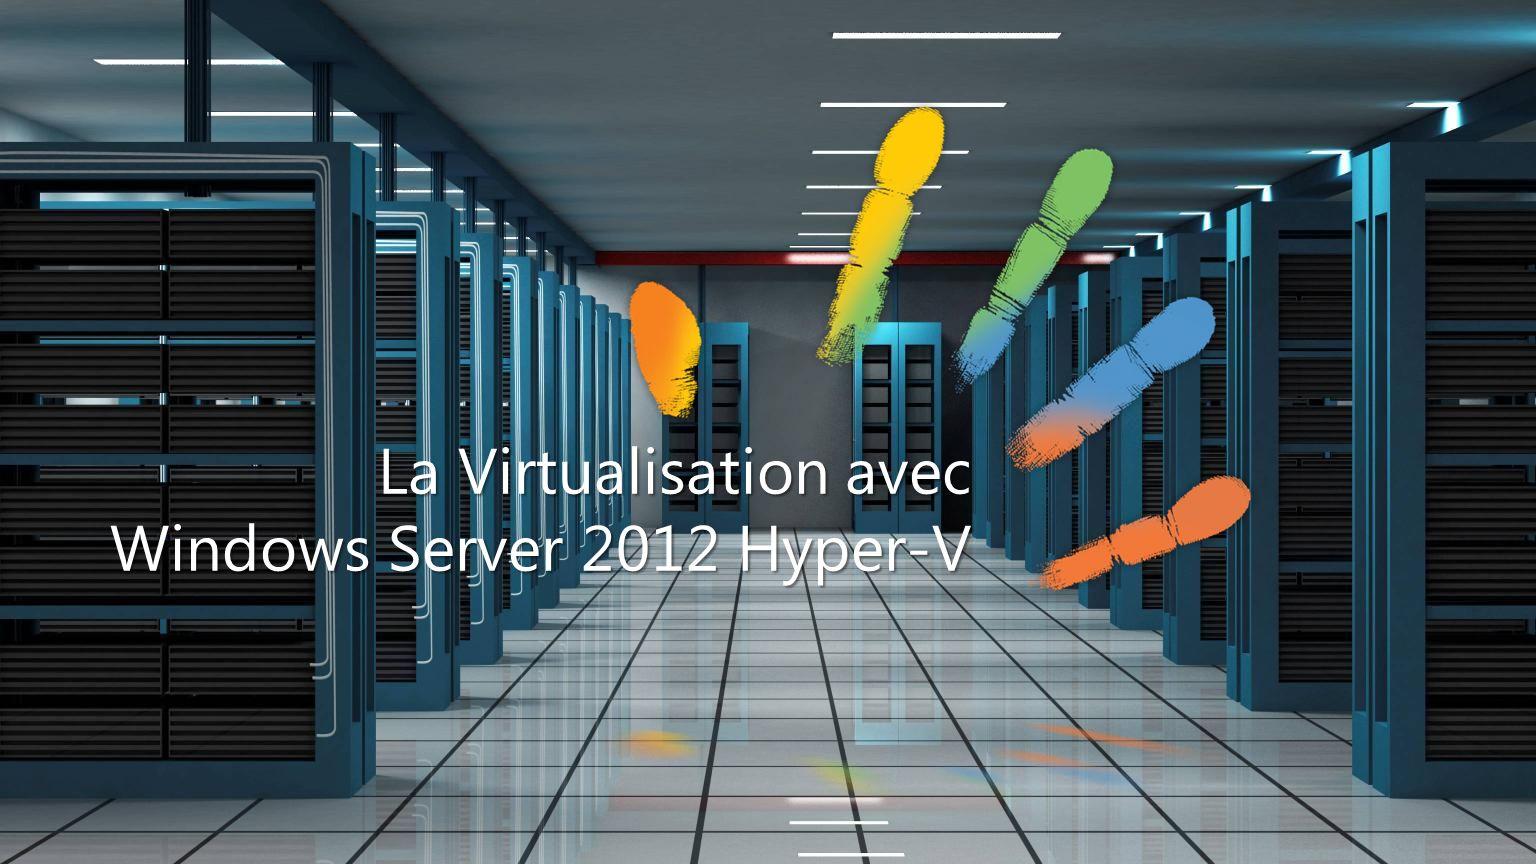 La Virtualisation avec Windows Server 2012 Hyper-V